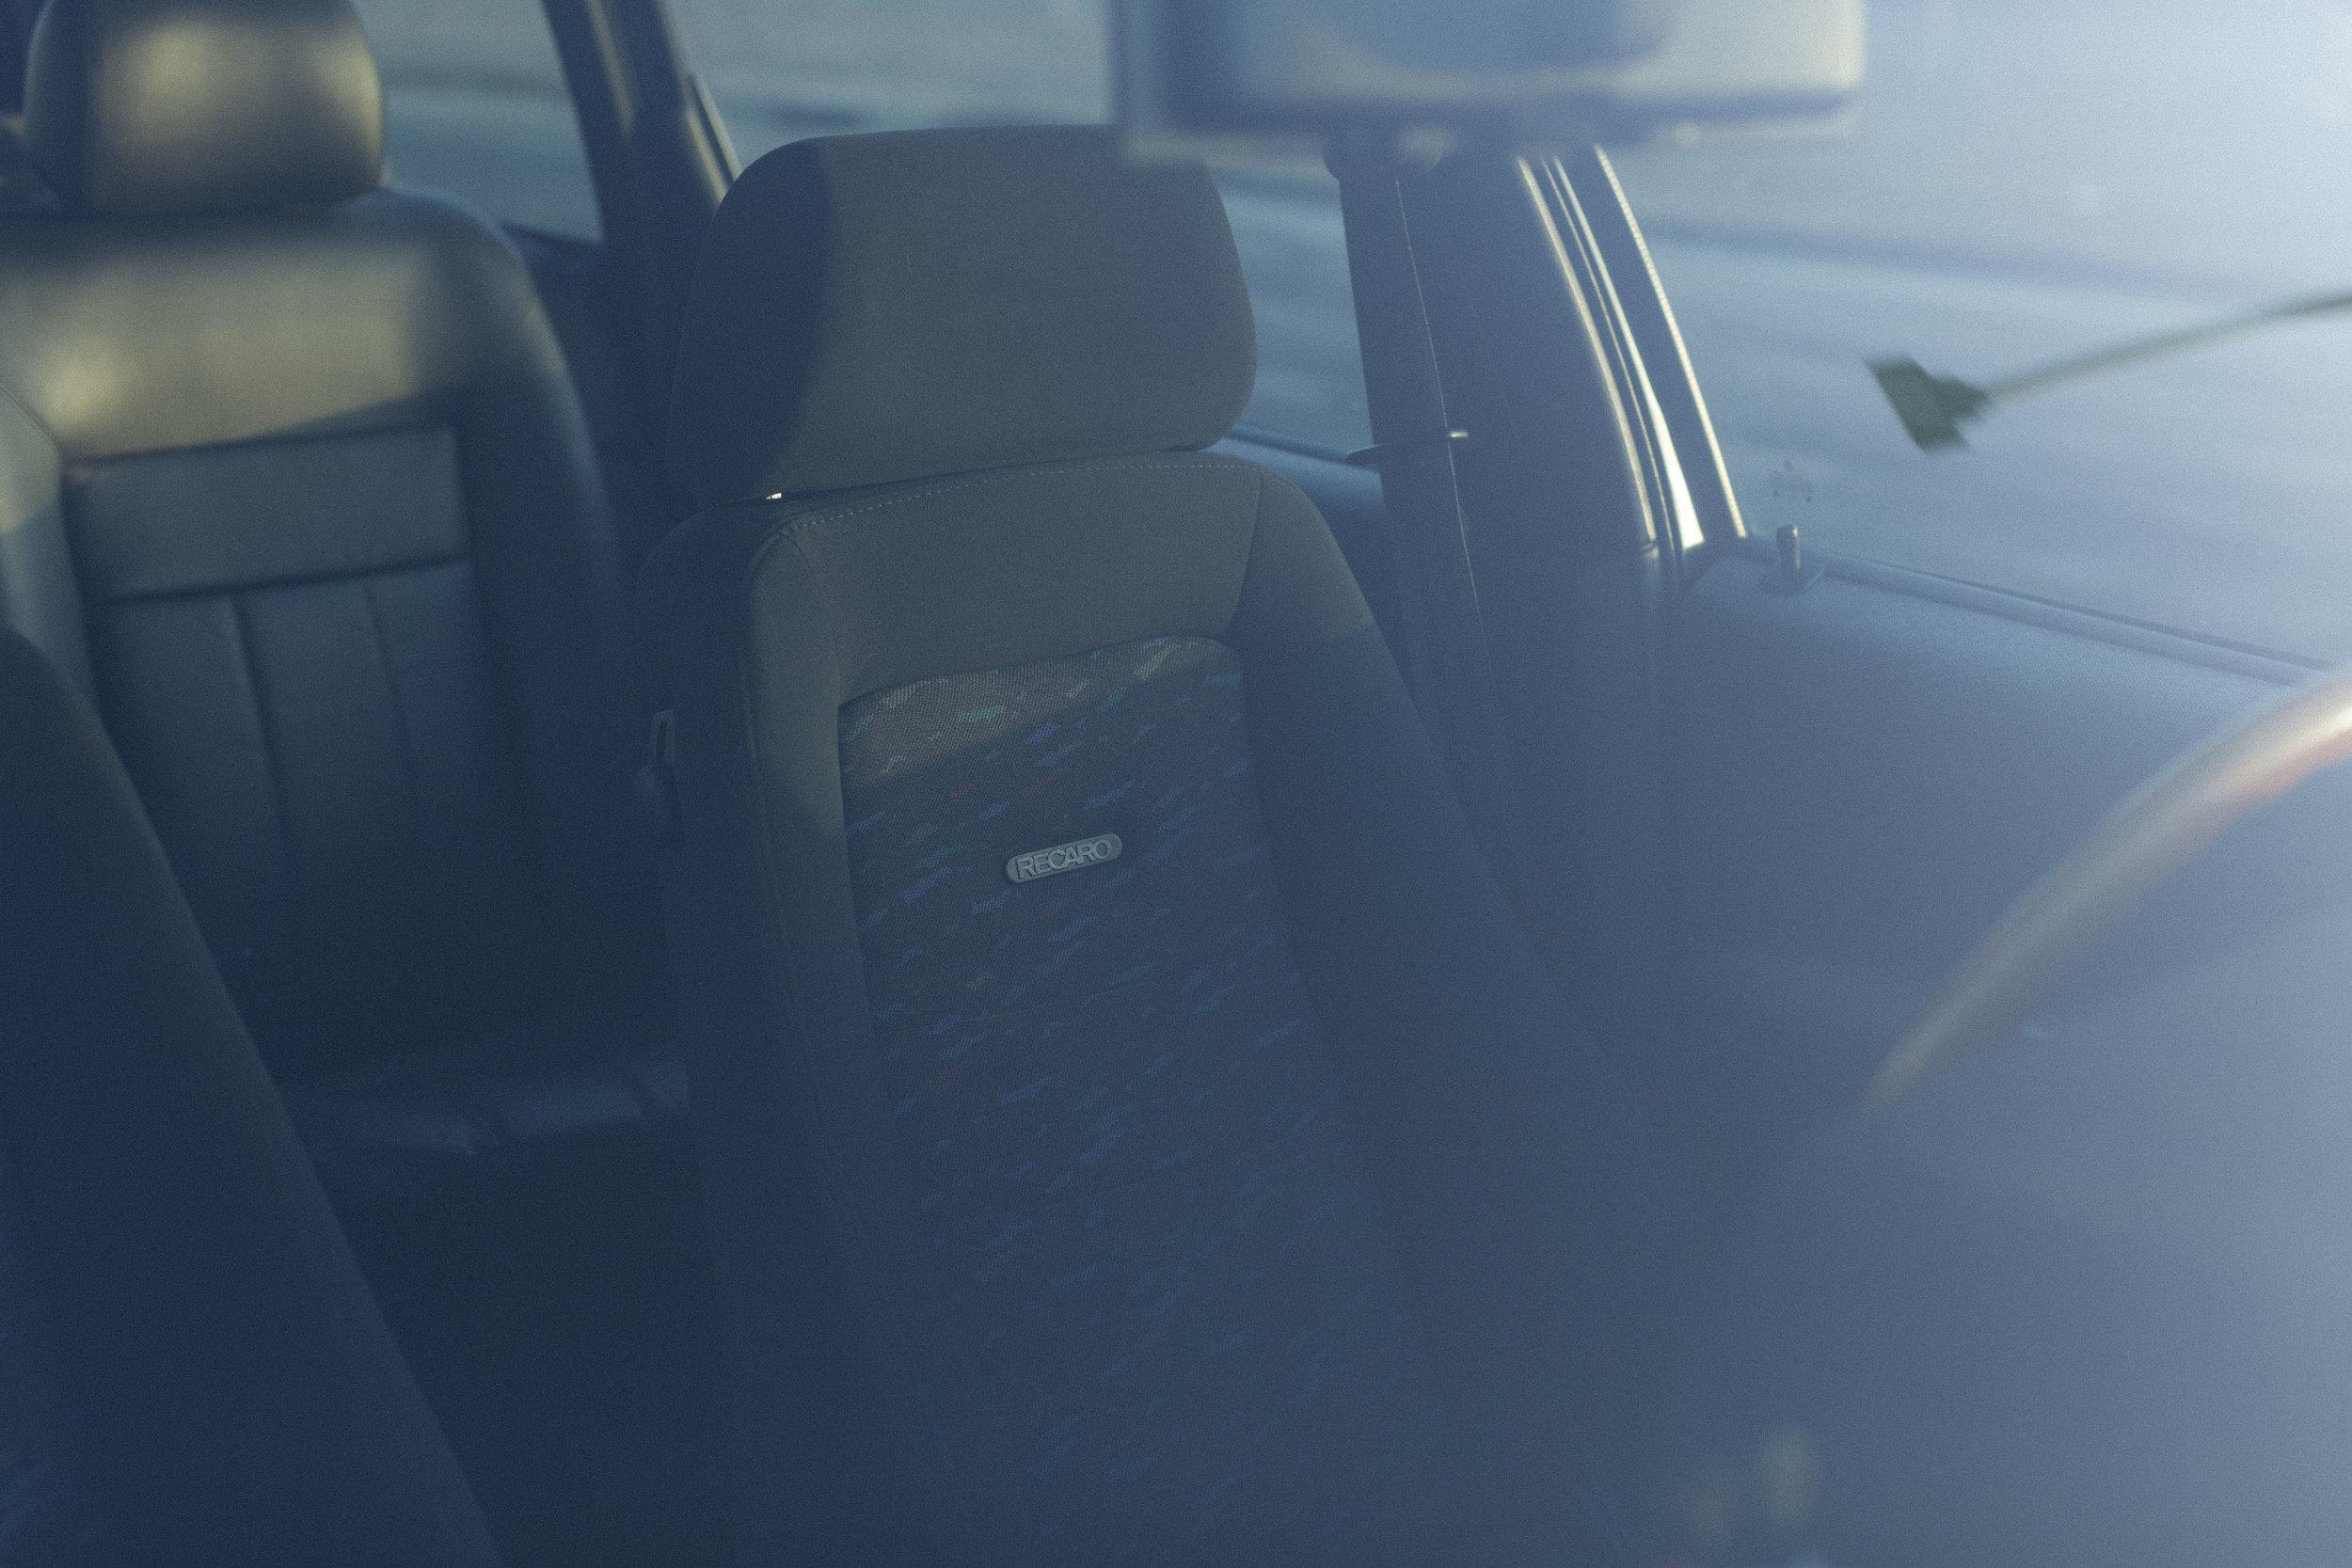 Neidfaktor-Audi-RS6-Avant-Dark-Ride-Project-335-960x480.jpg